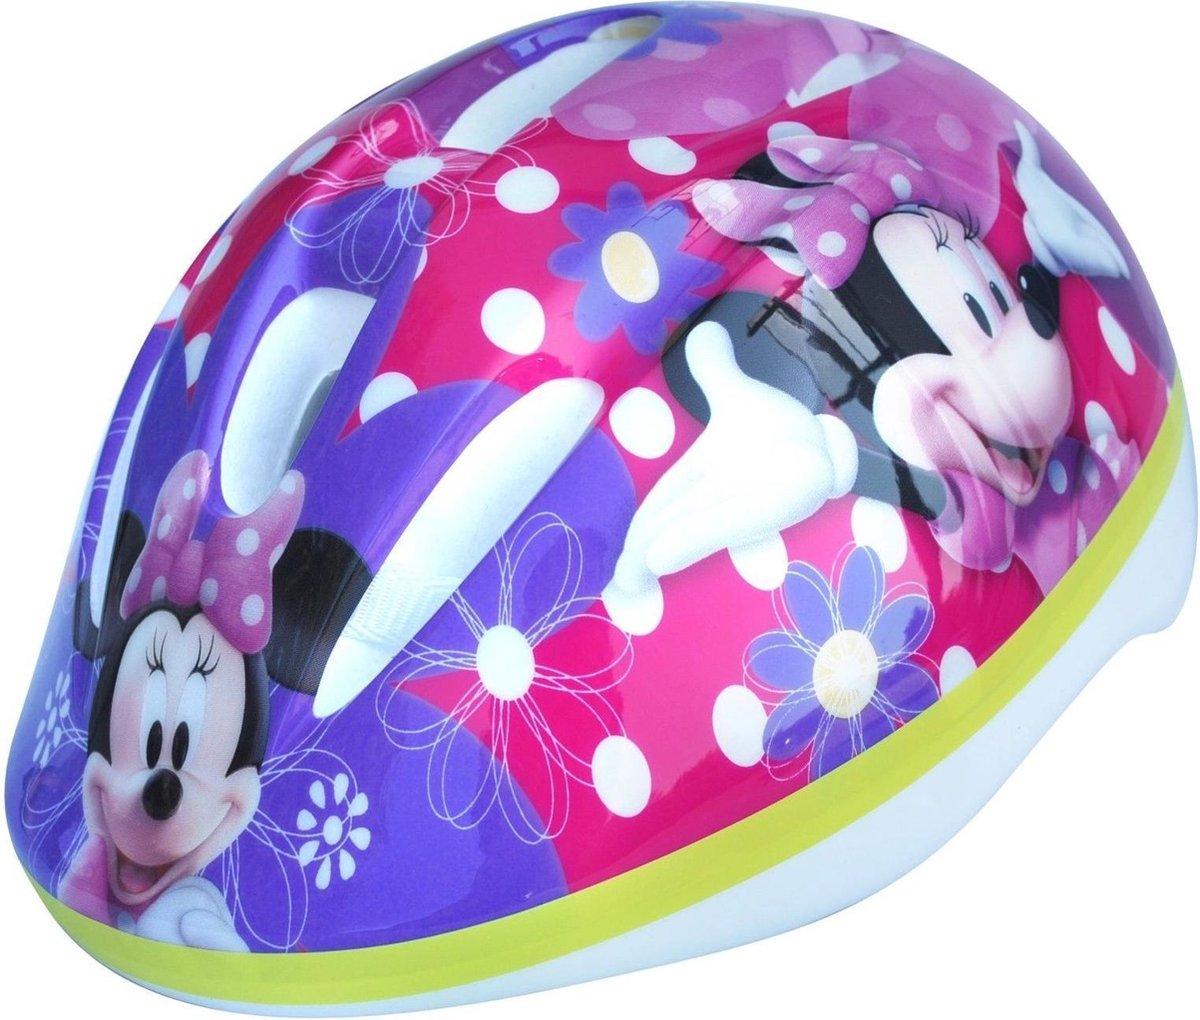 Disney Kinderhelm Minnie Mouse Roze/paars Maat XS 49-51